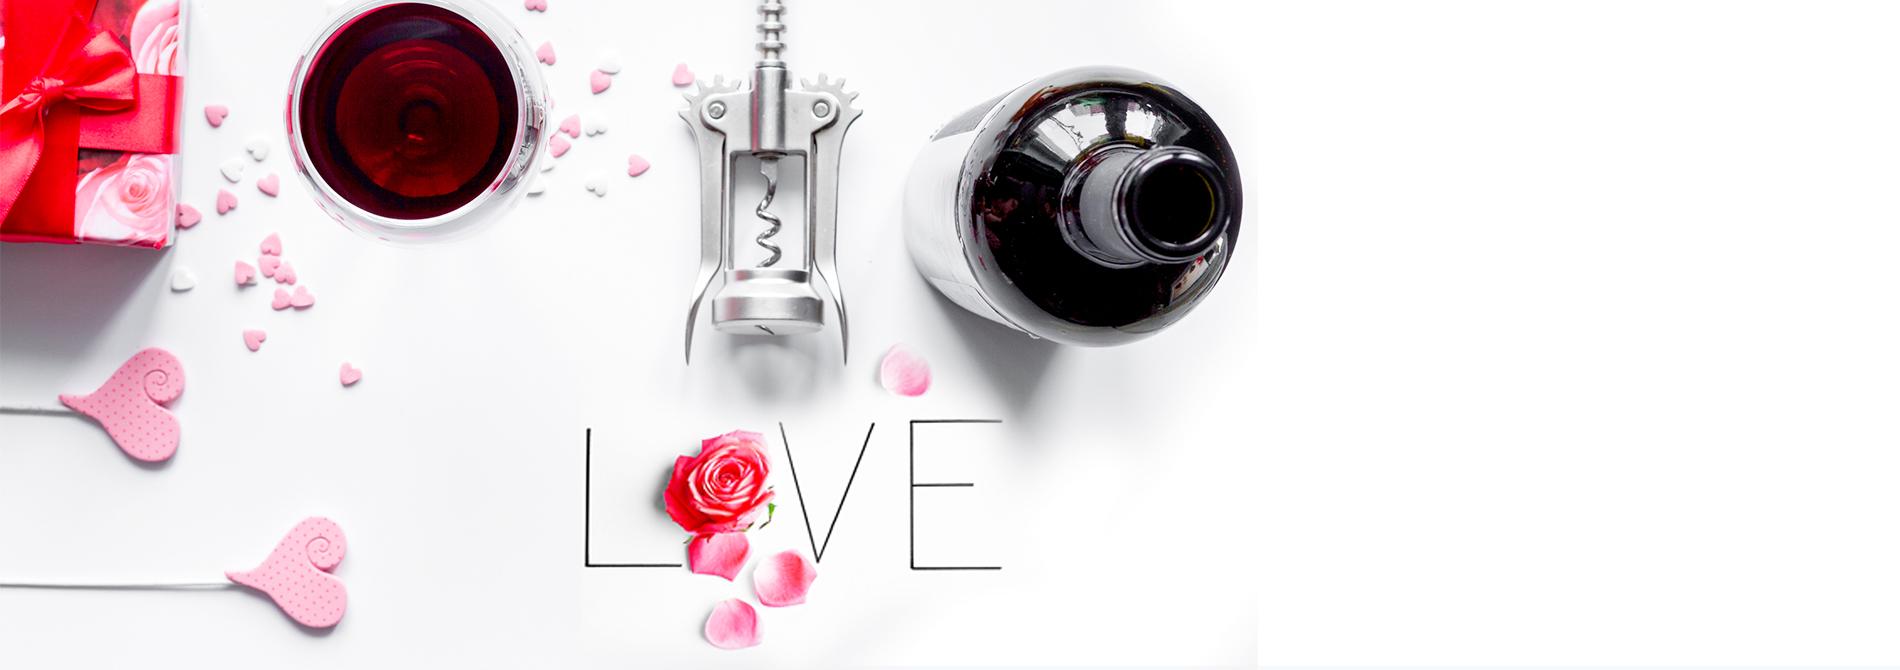 presente experiencia romanticas amor supresa jantar degustaçao